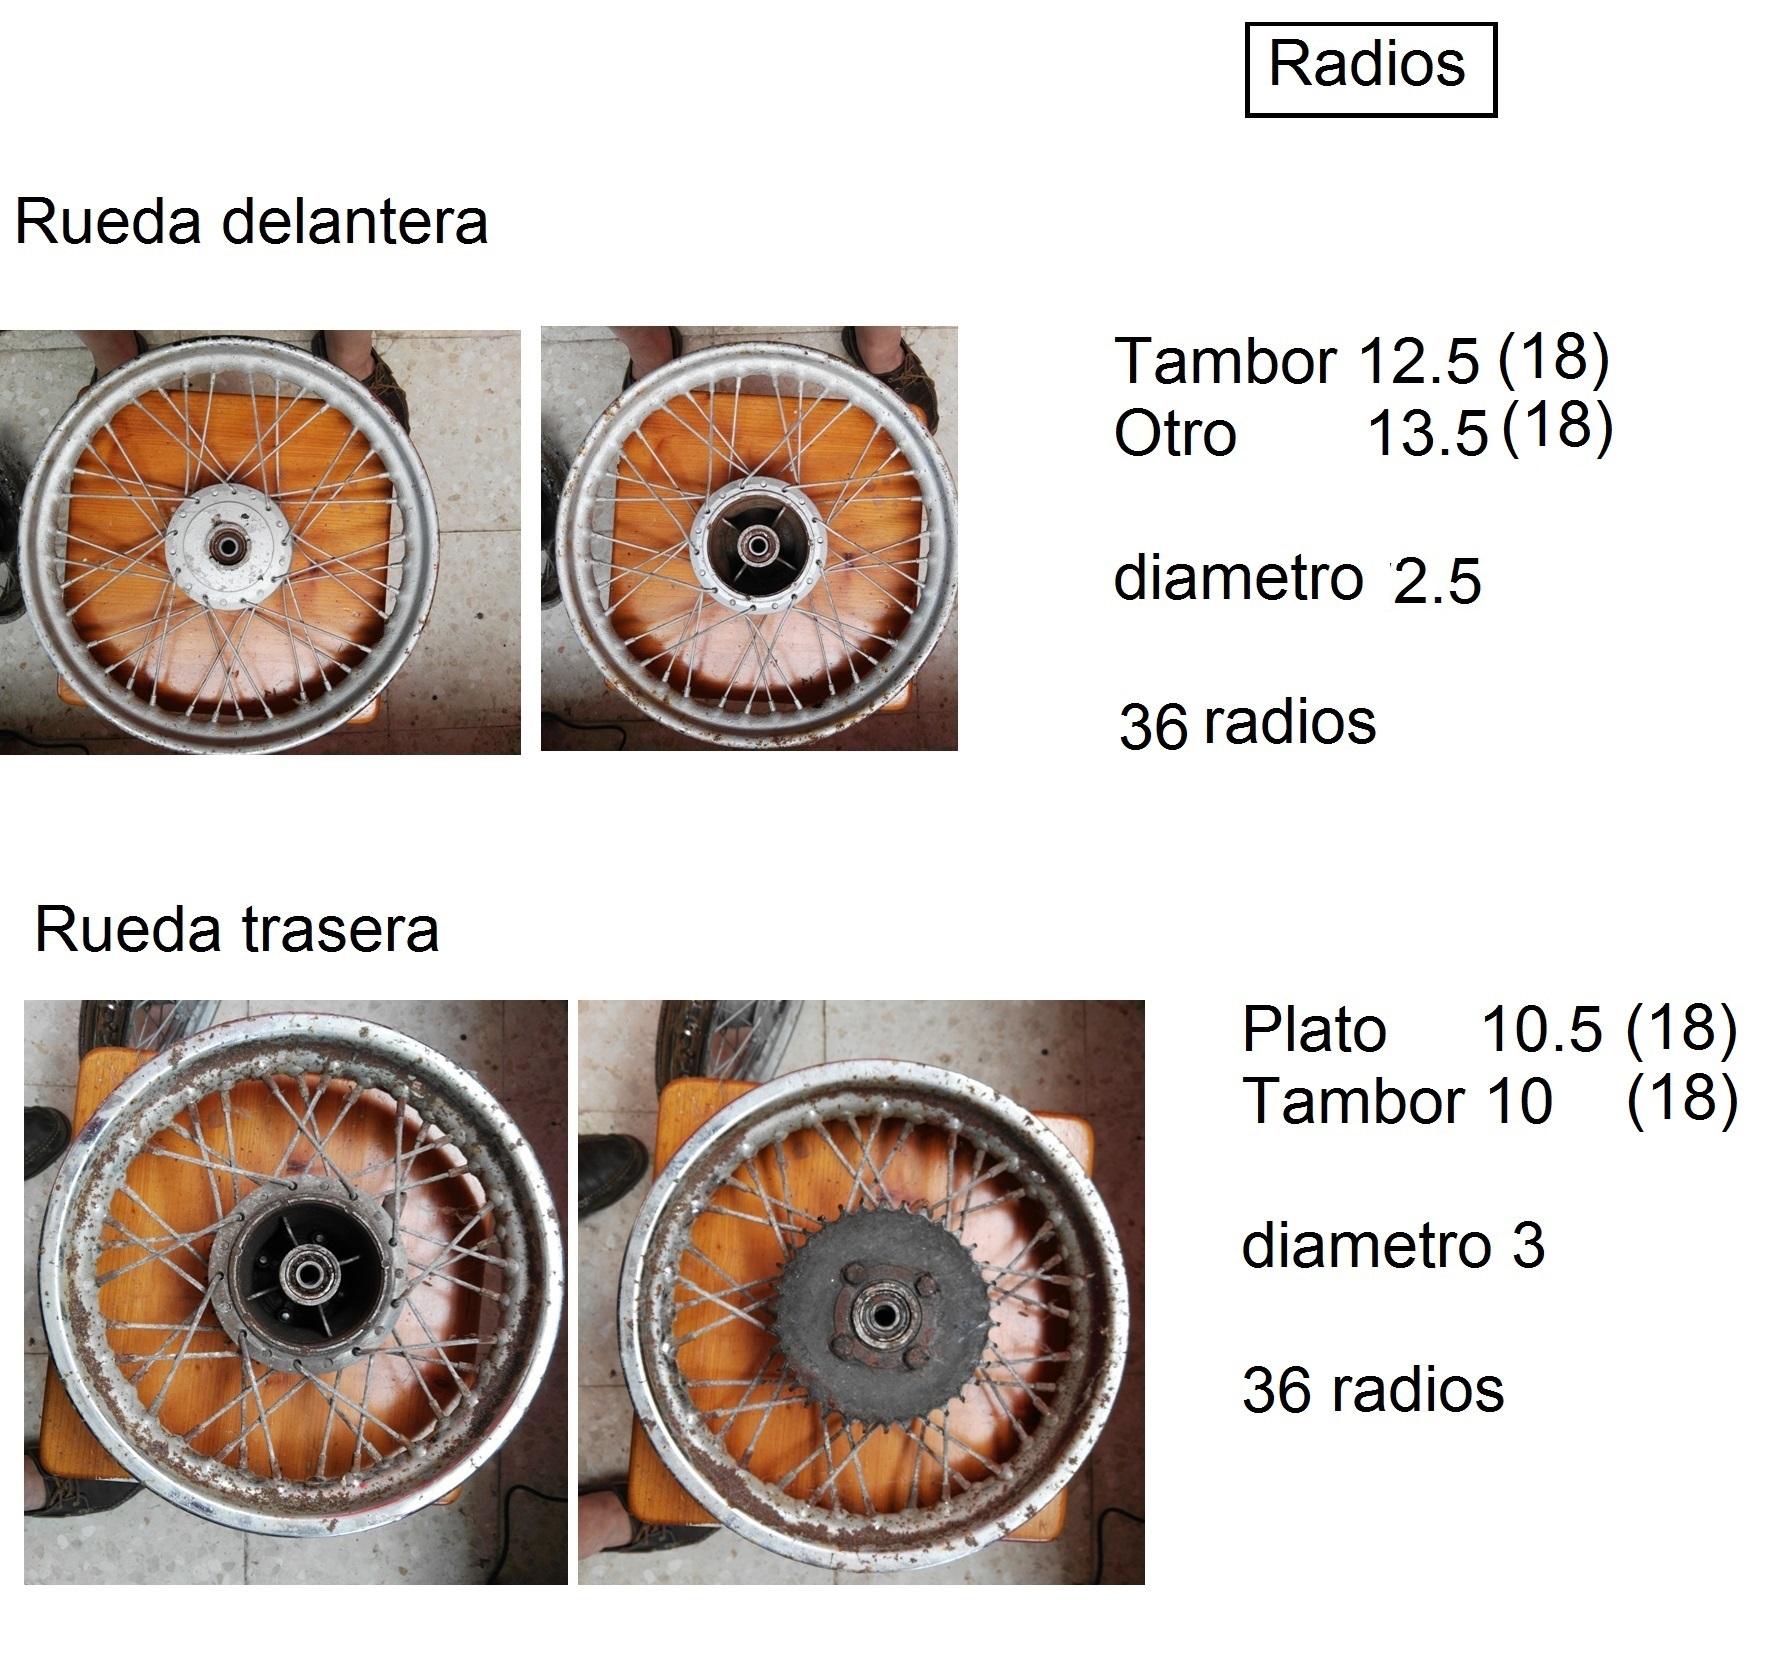 Puch Magnum X - Medidas De Radios Radios-medidas